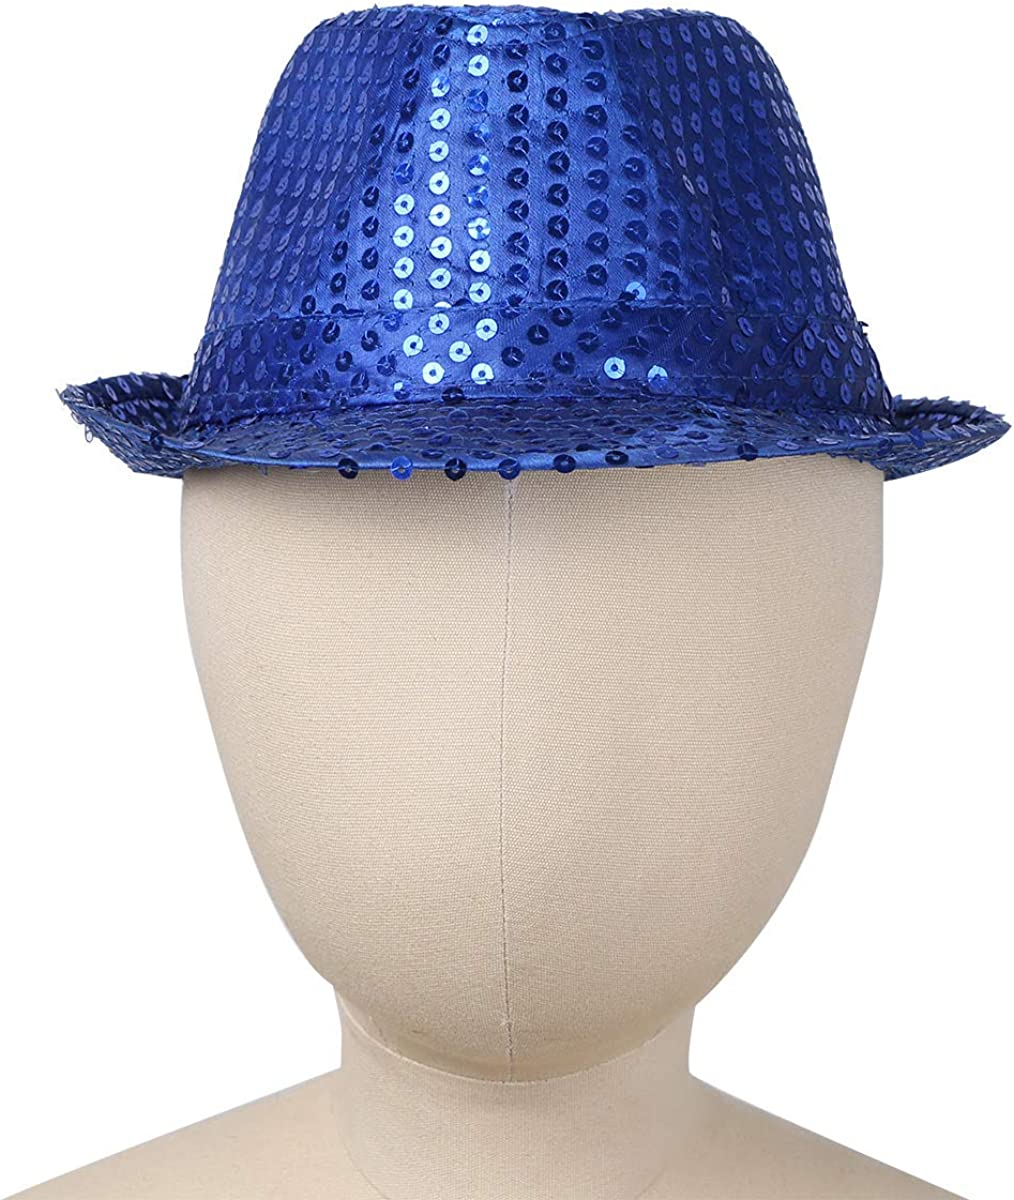 JEATHA Kids Girls Boys Glittering Sequins Pure Color Hip Hop Jazz Dancewear Cap Street Dancing Accessories Fedora Hat